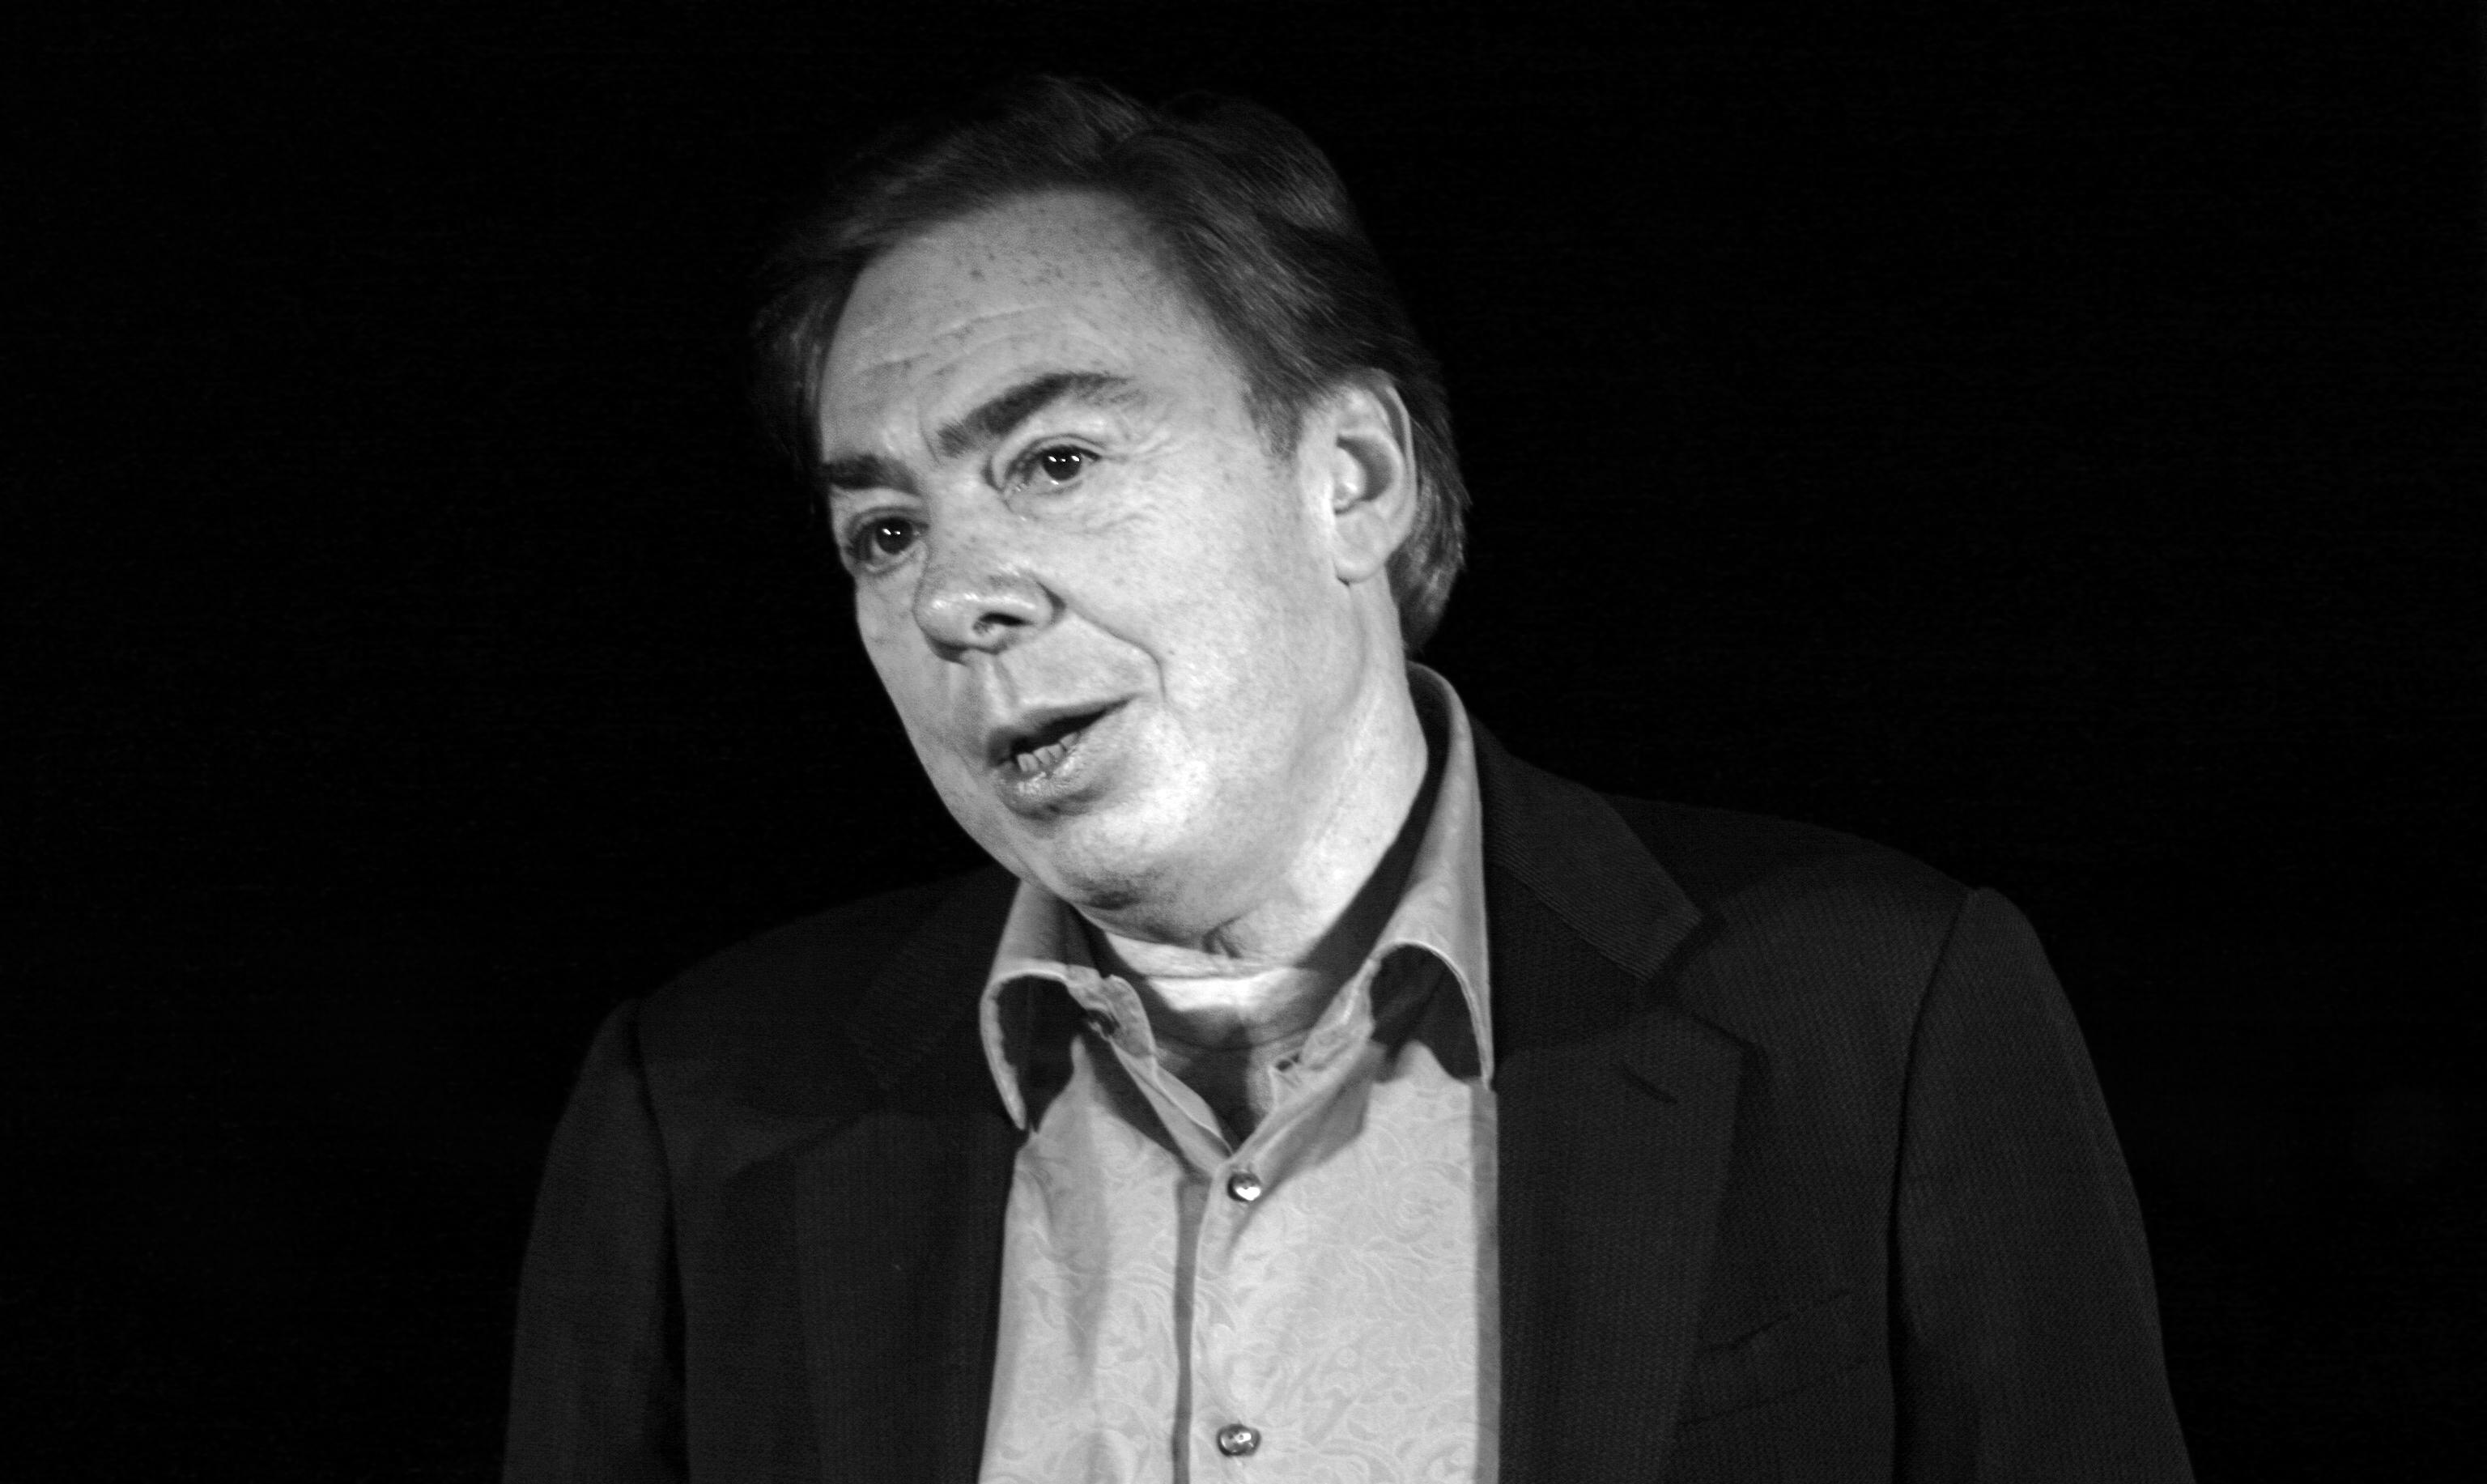 Depiction of Andrew Lloyd Webber